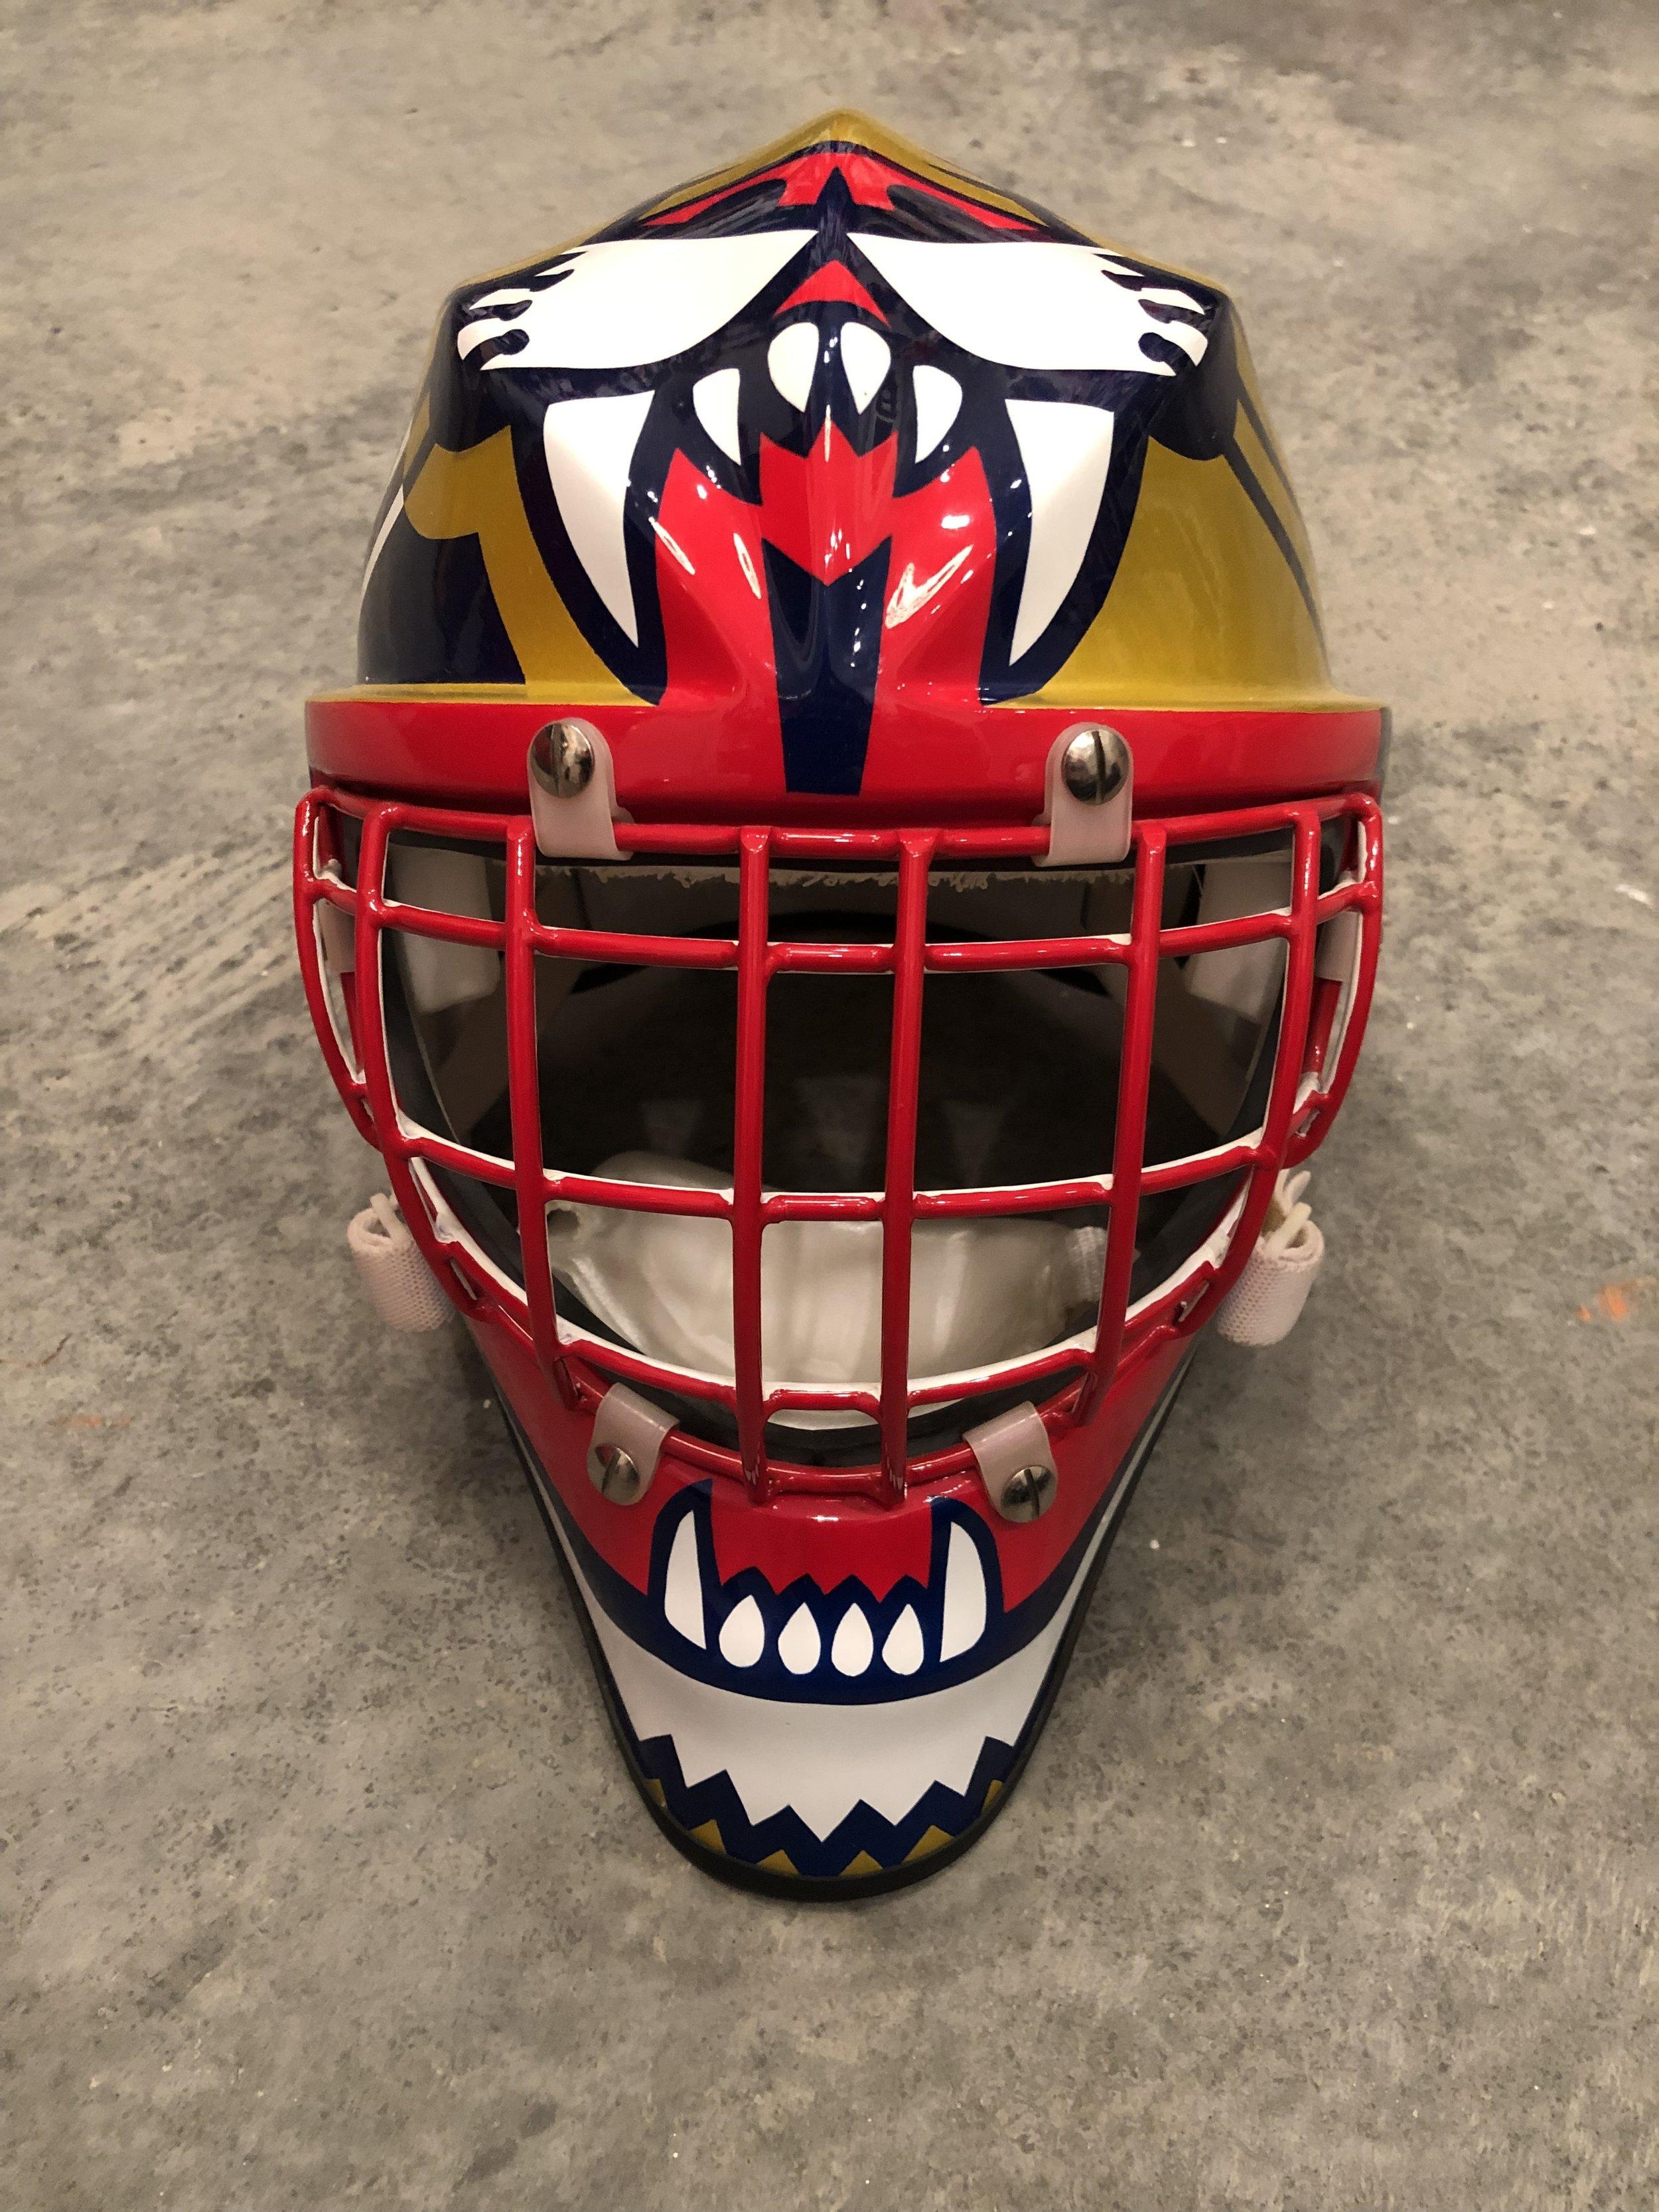 1996 John Vanbiesbrouck Florida Panthers game issued mask